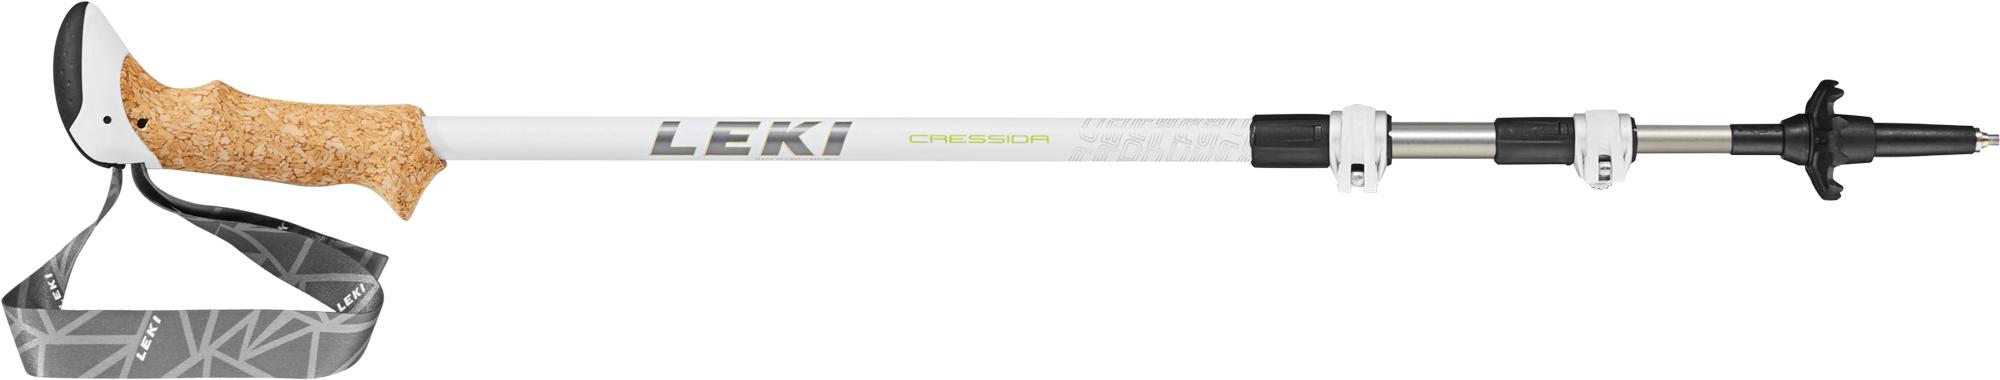 Leki Cressida - ultraleichte Damen Trekkingstöcke (90-125 cm)